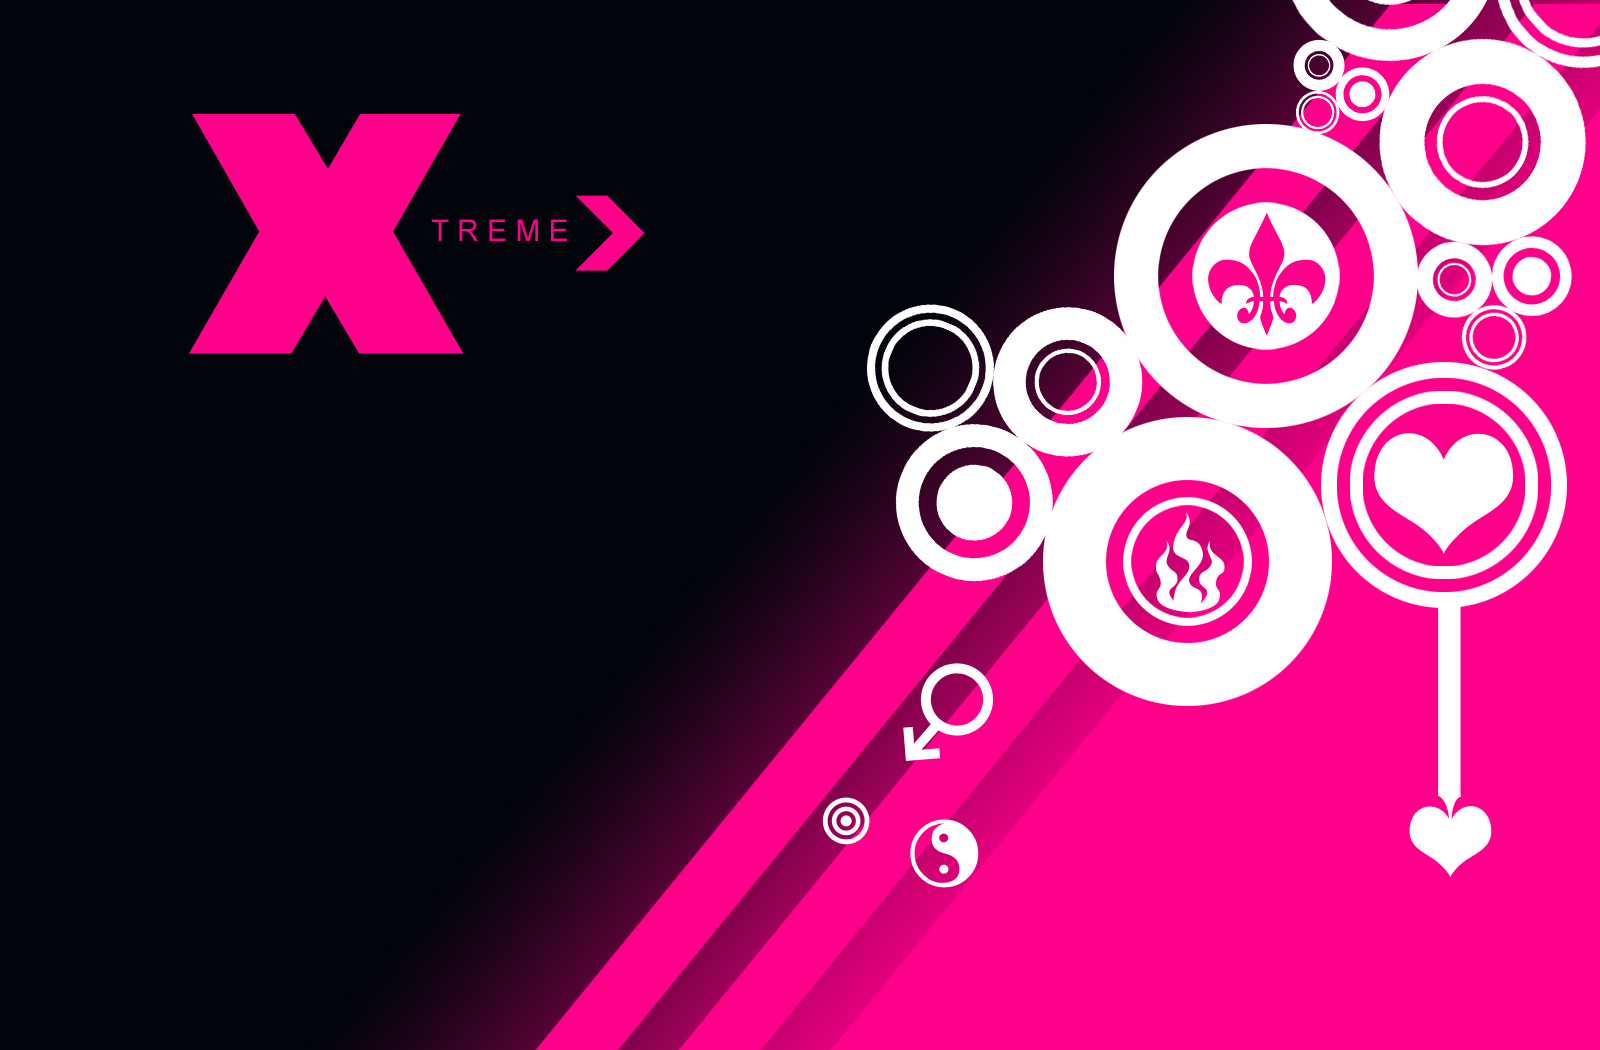 Wallpaper Black And Pink Desktop Cool Wallpapers 1600x1050